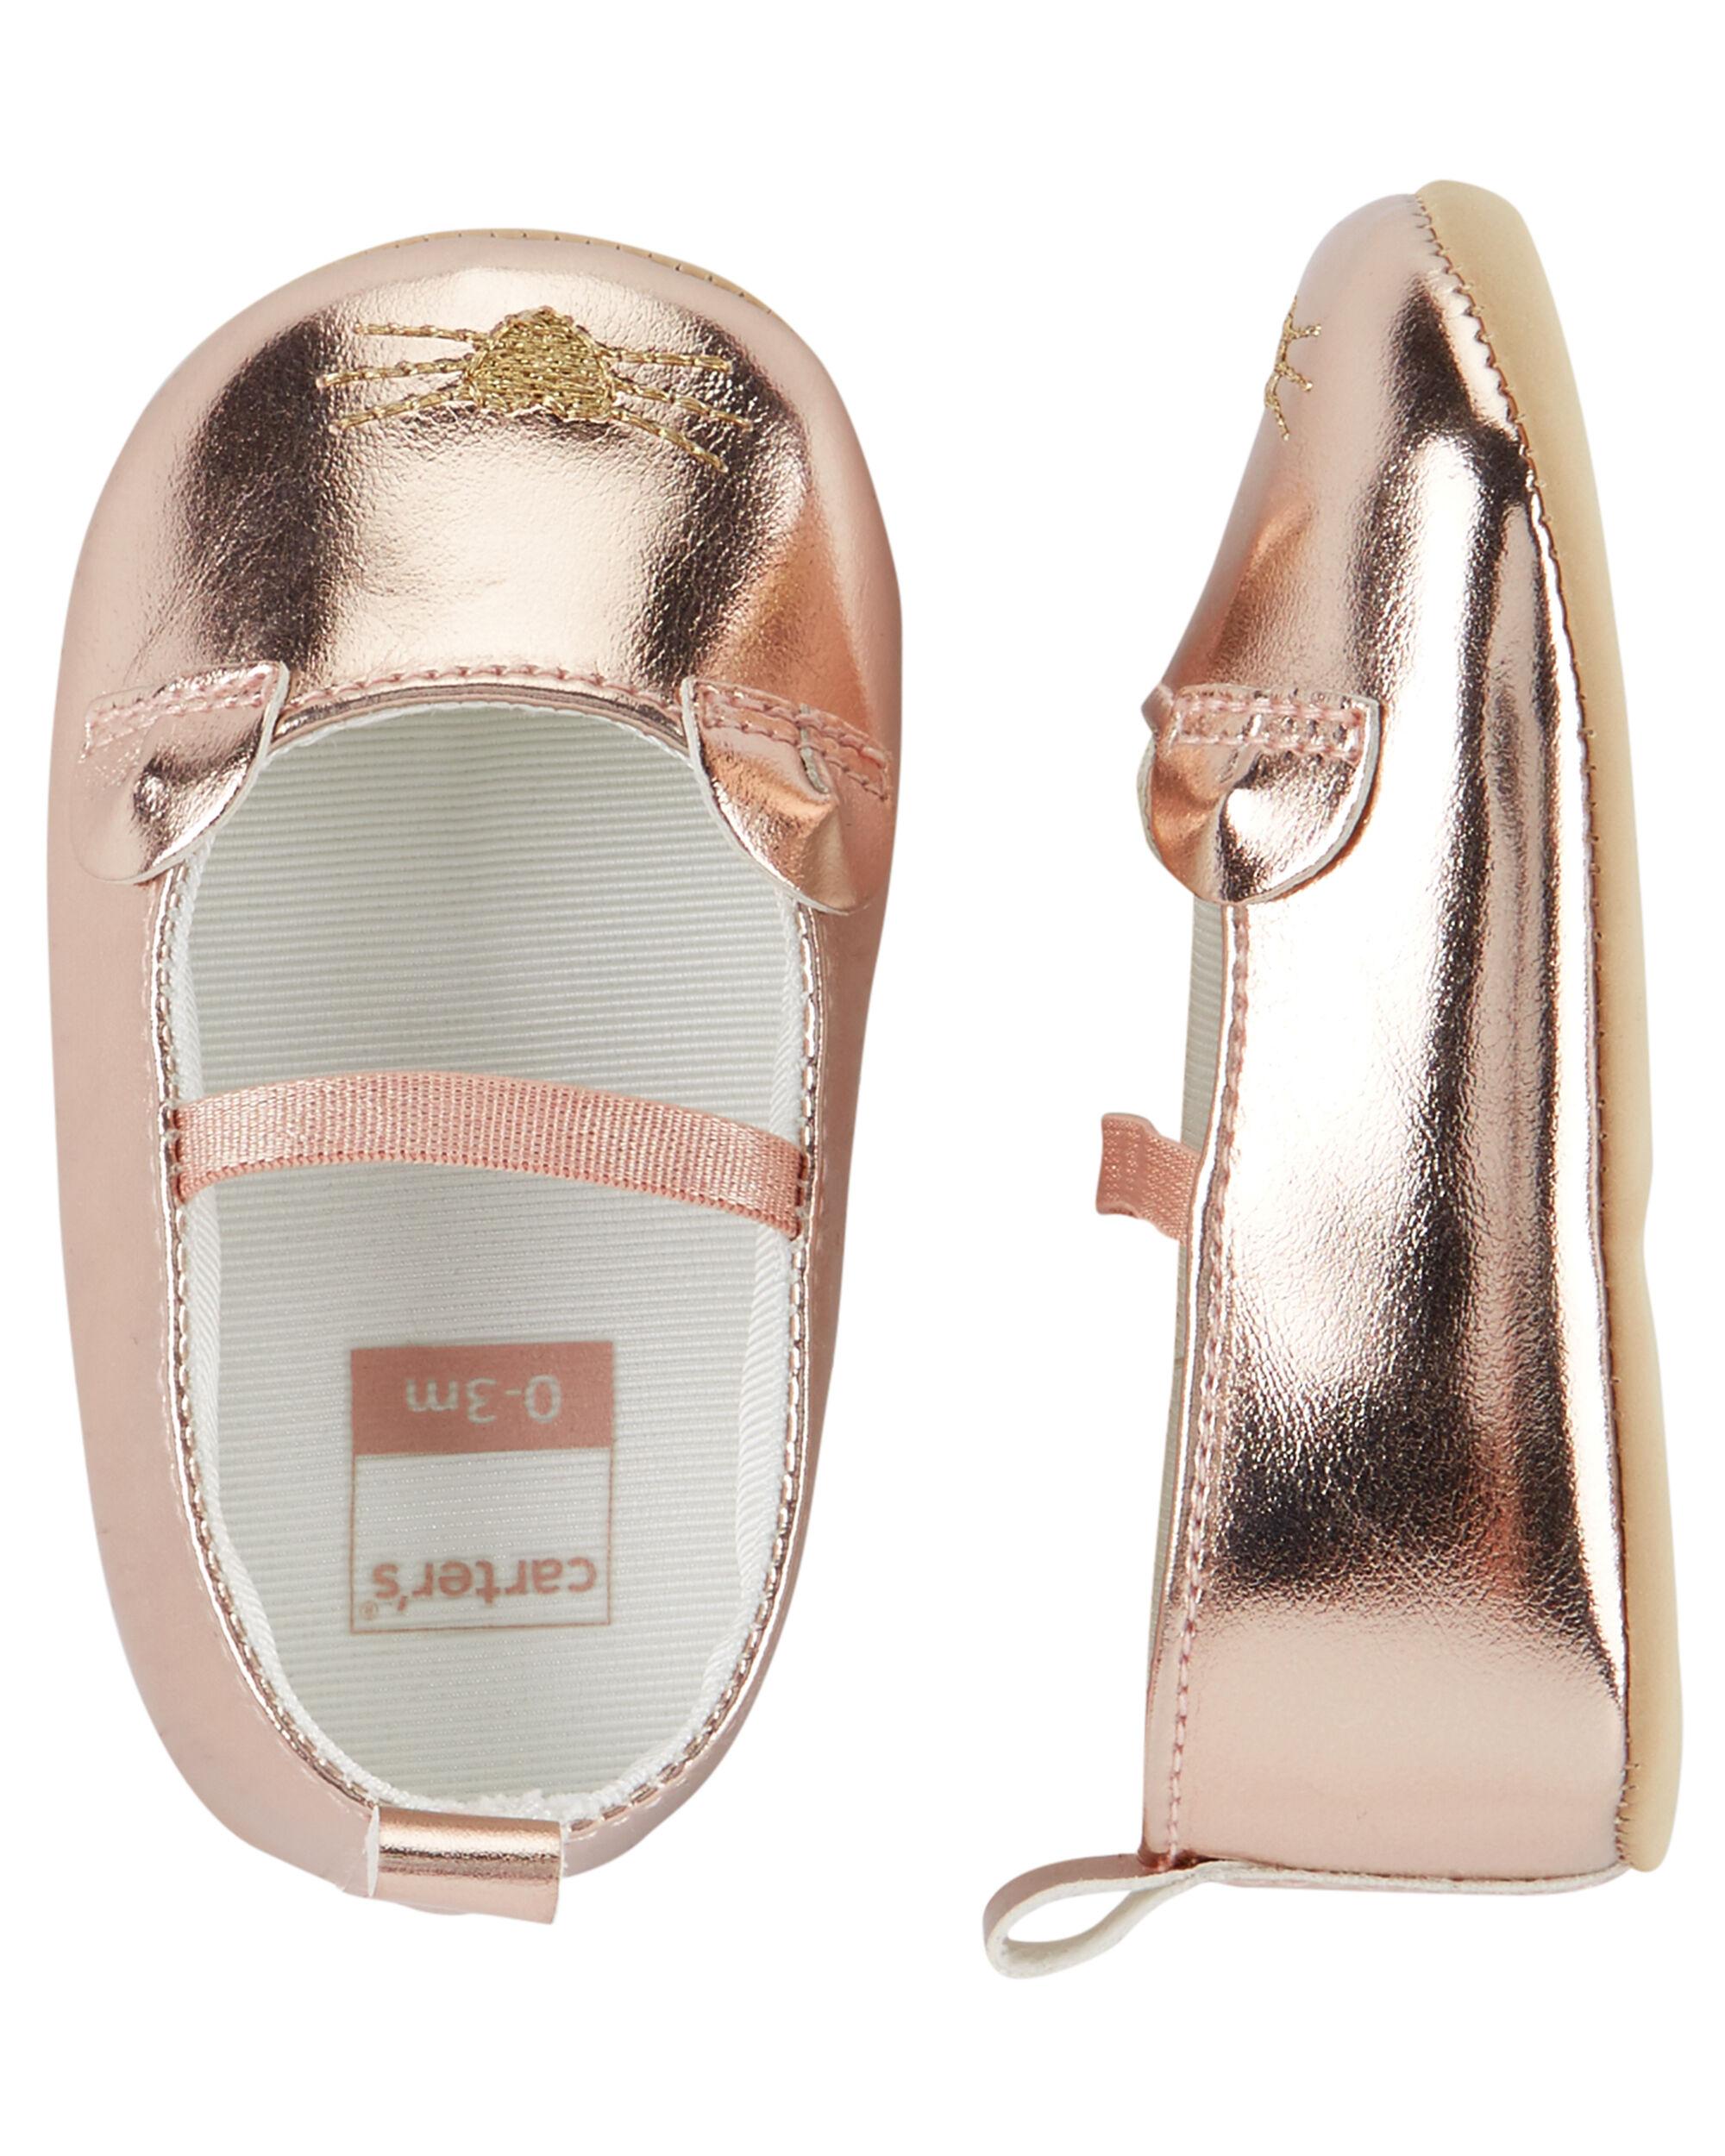 Carter's Mary Jane Crib Shoes | carters.com